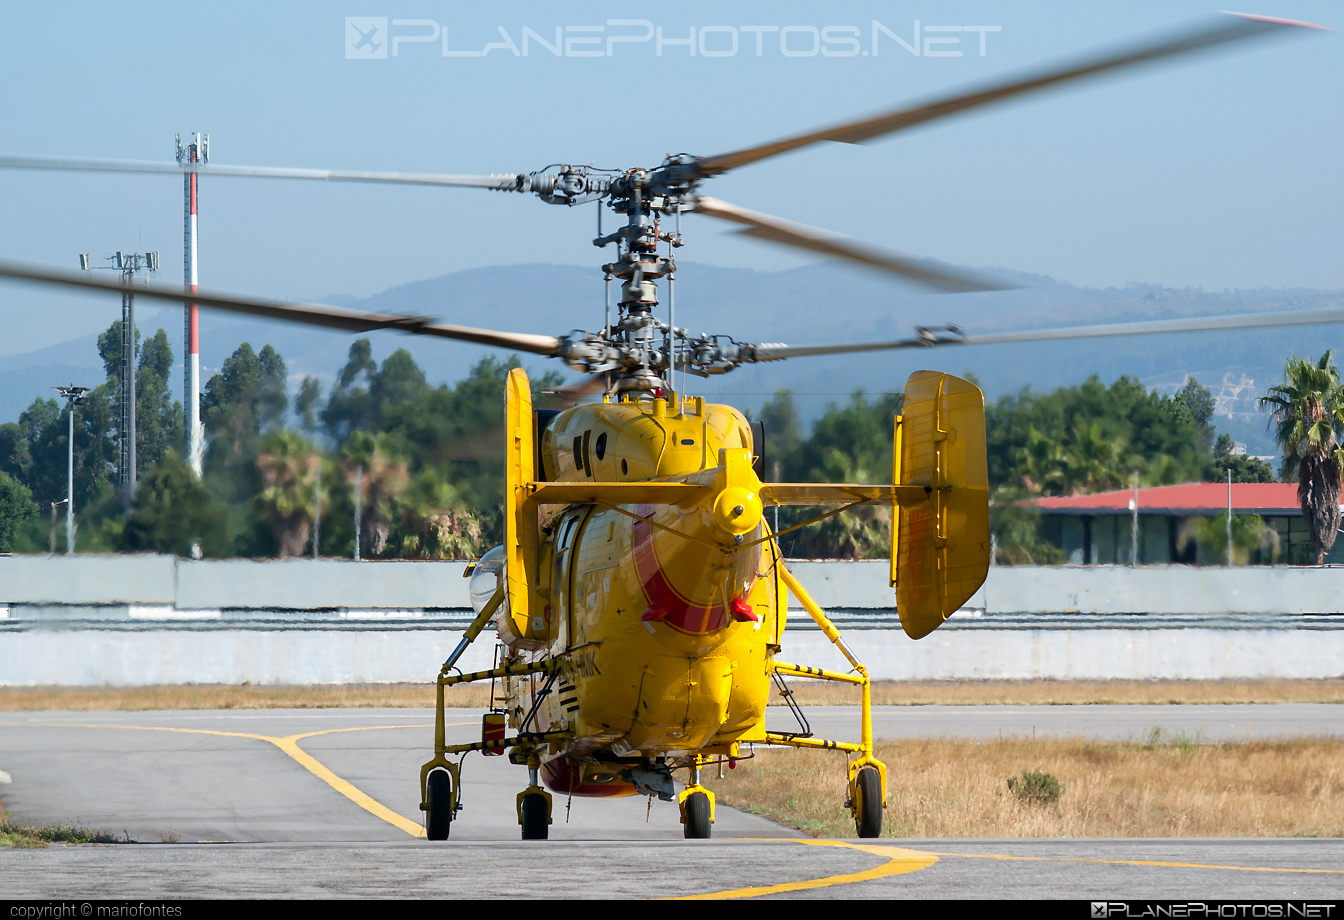 Kamov Ka-32A11BC - CS-HMK operated by Proteção Civil (Portugal Civil Protection) #ka32 #ka32a11bc #kamov #kamov32 #kamovka32 #portugalcivilprotection #protecaocivil